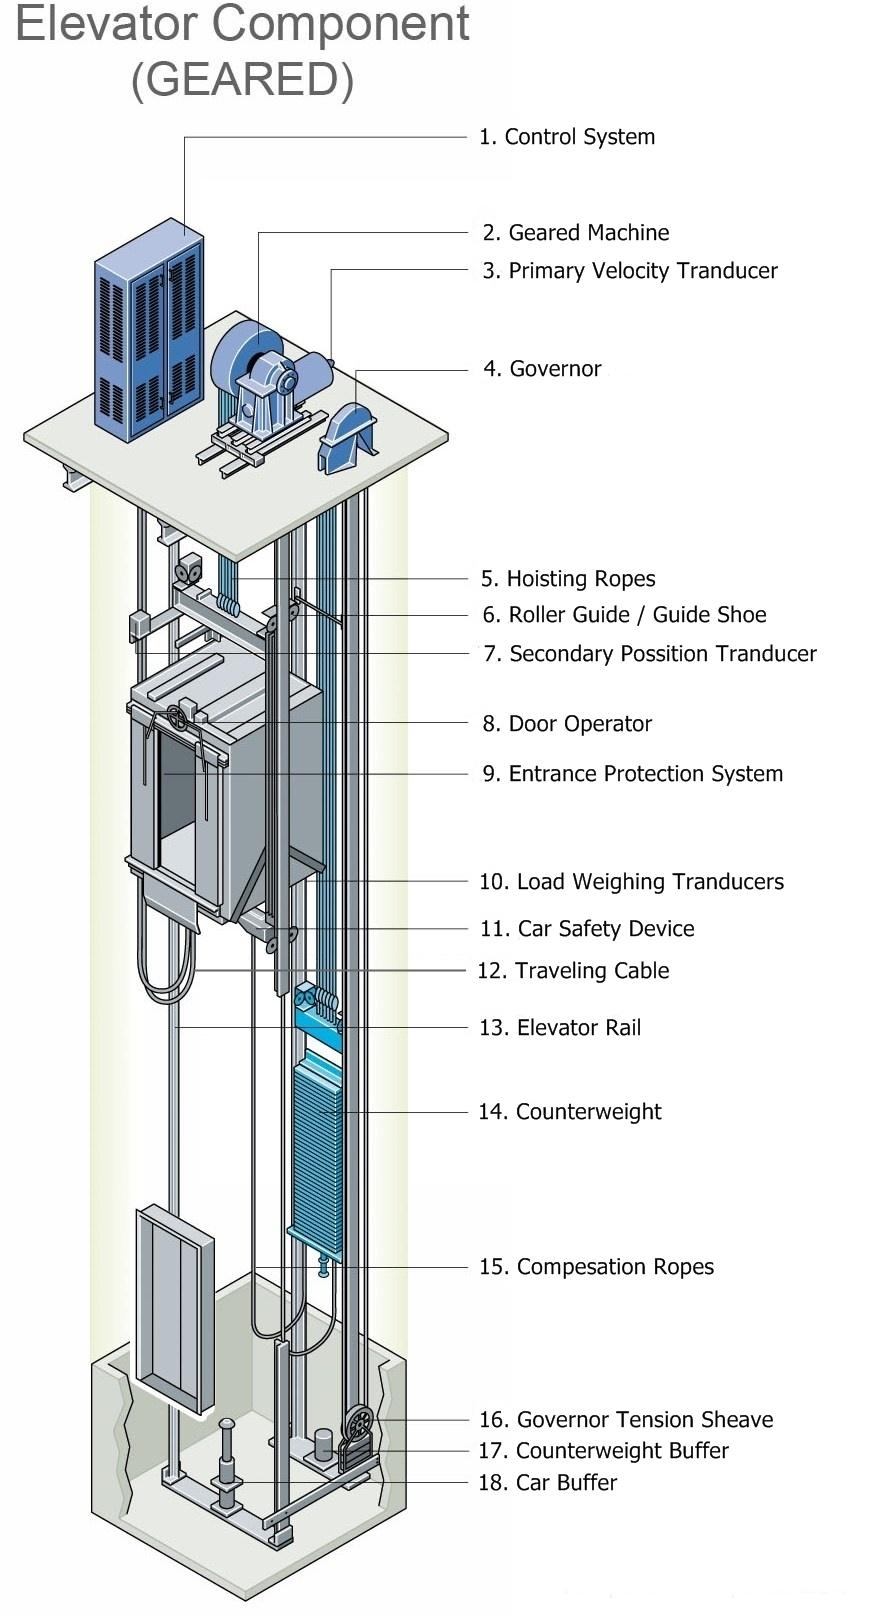 Fungsi komponen pada Elevator